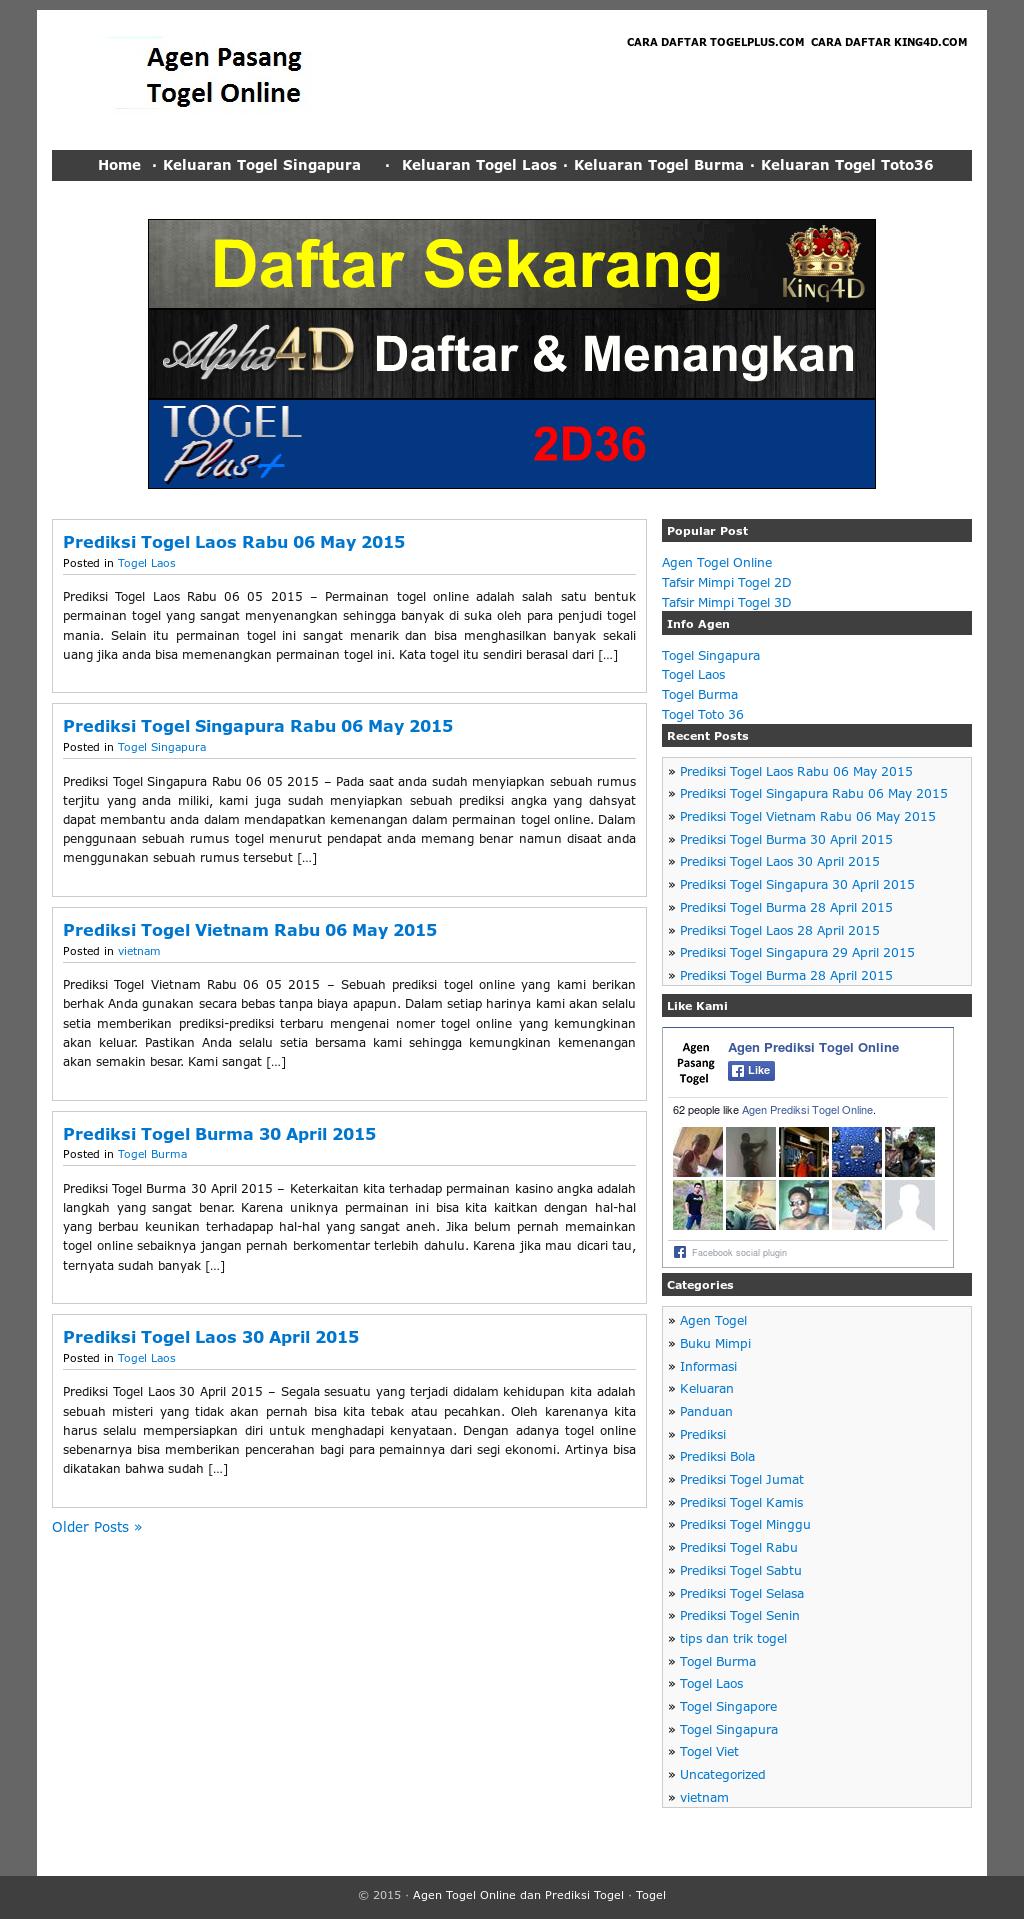 Agen Prediksi Togel Online Competitors, Revenue and